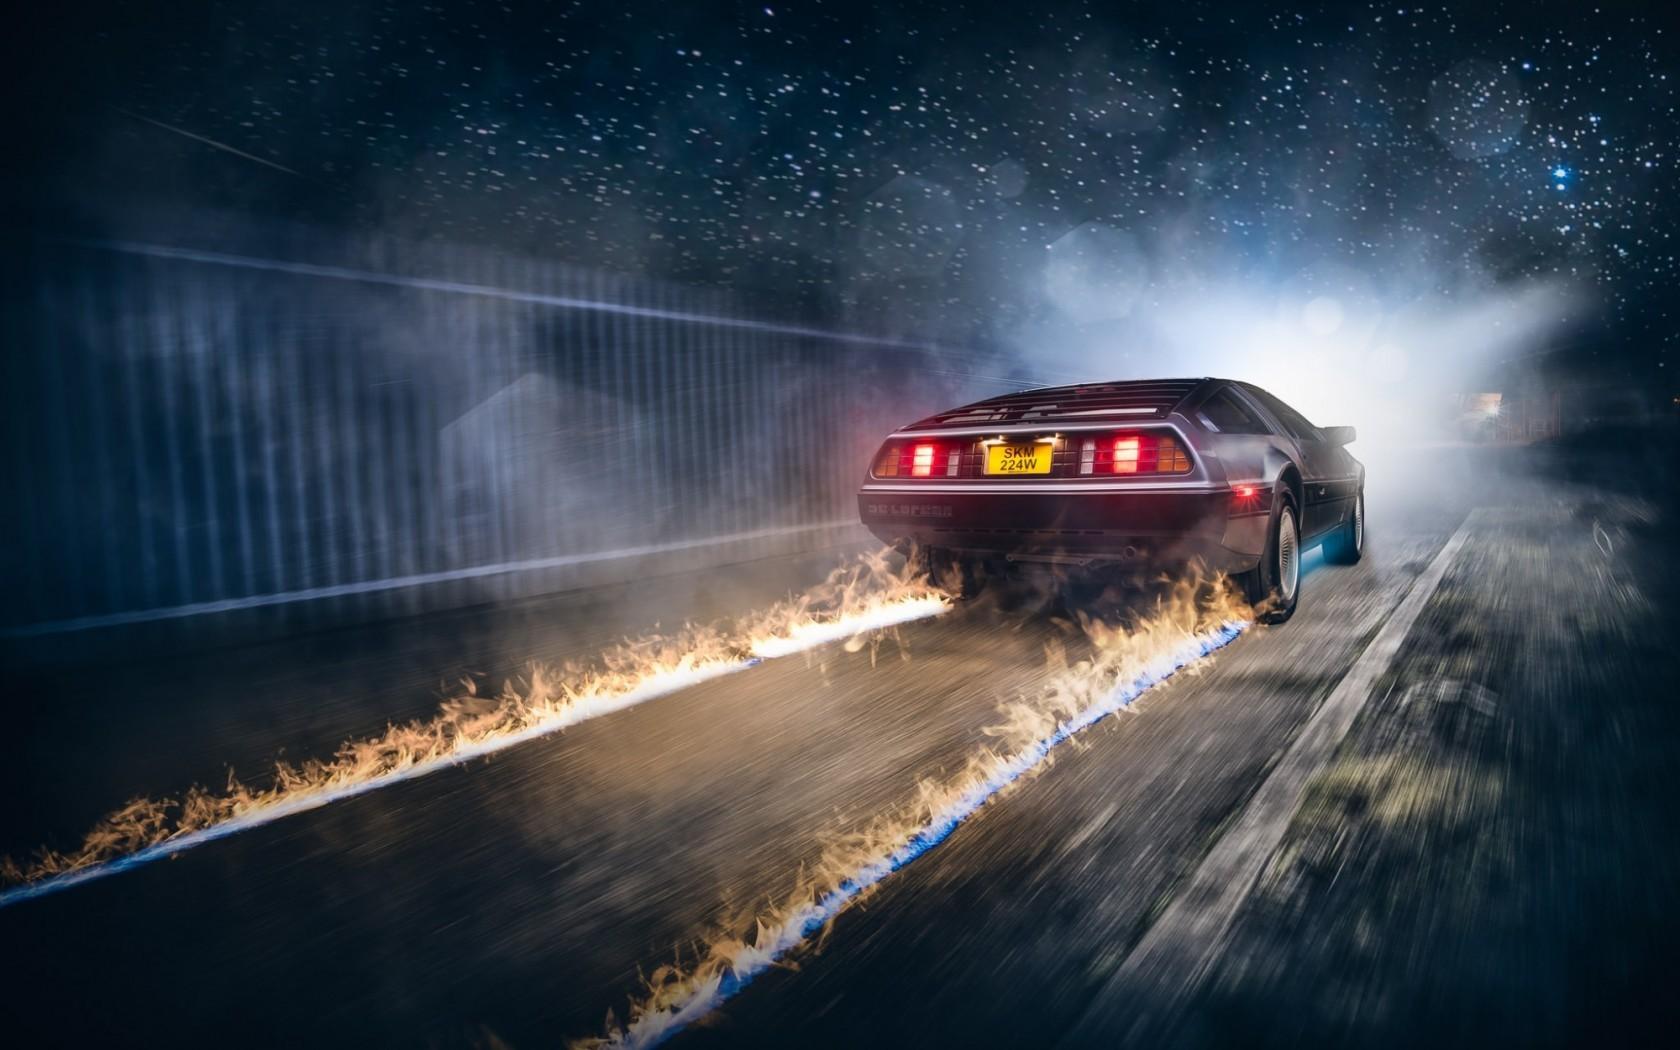 Wallpaper Night Car Vehicle Artwork Movies Fire Back